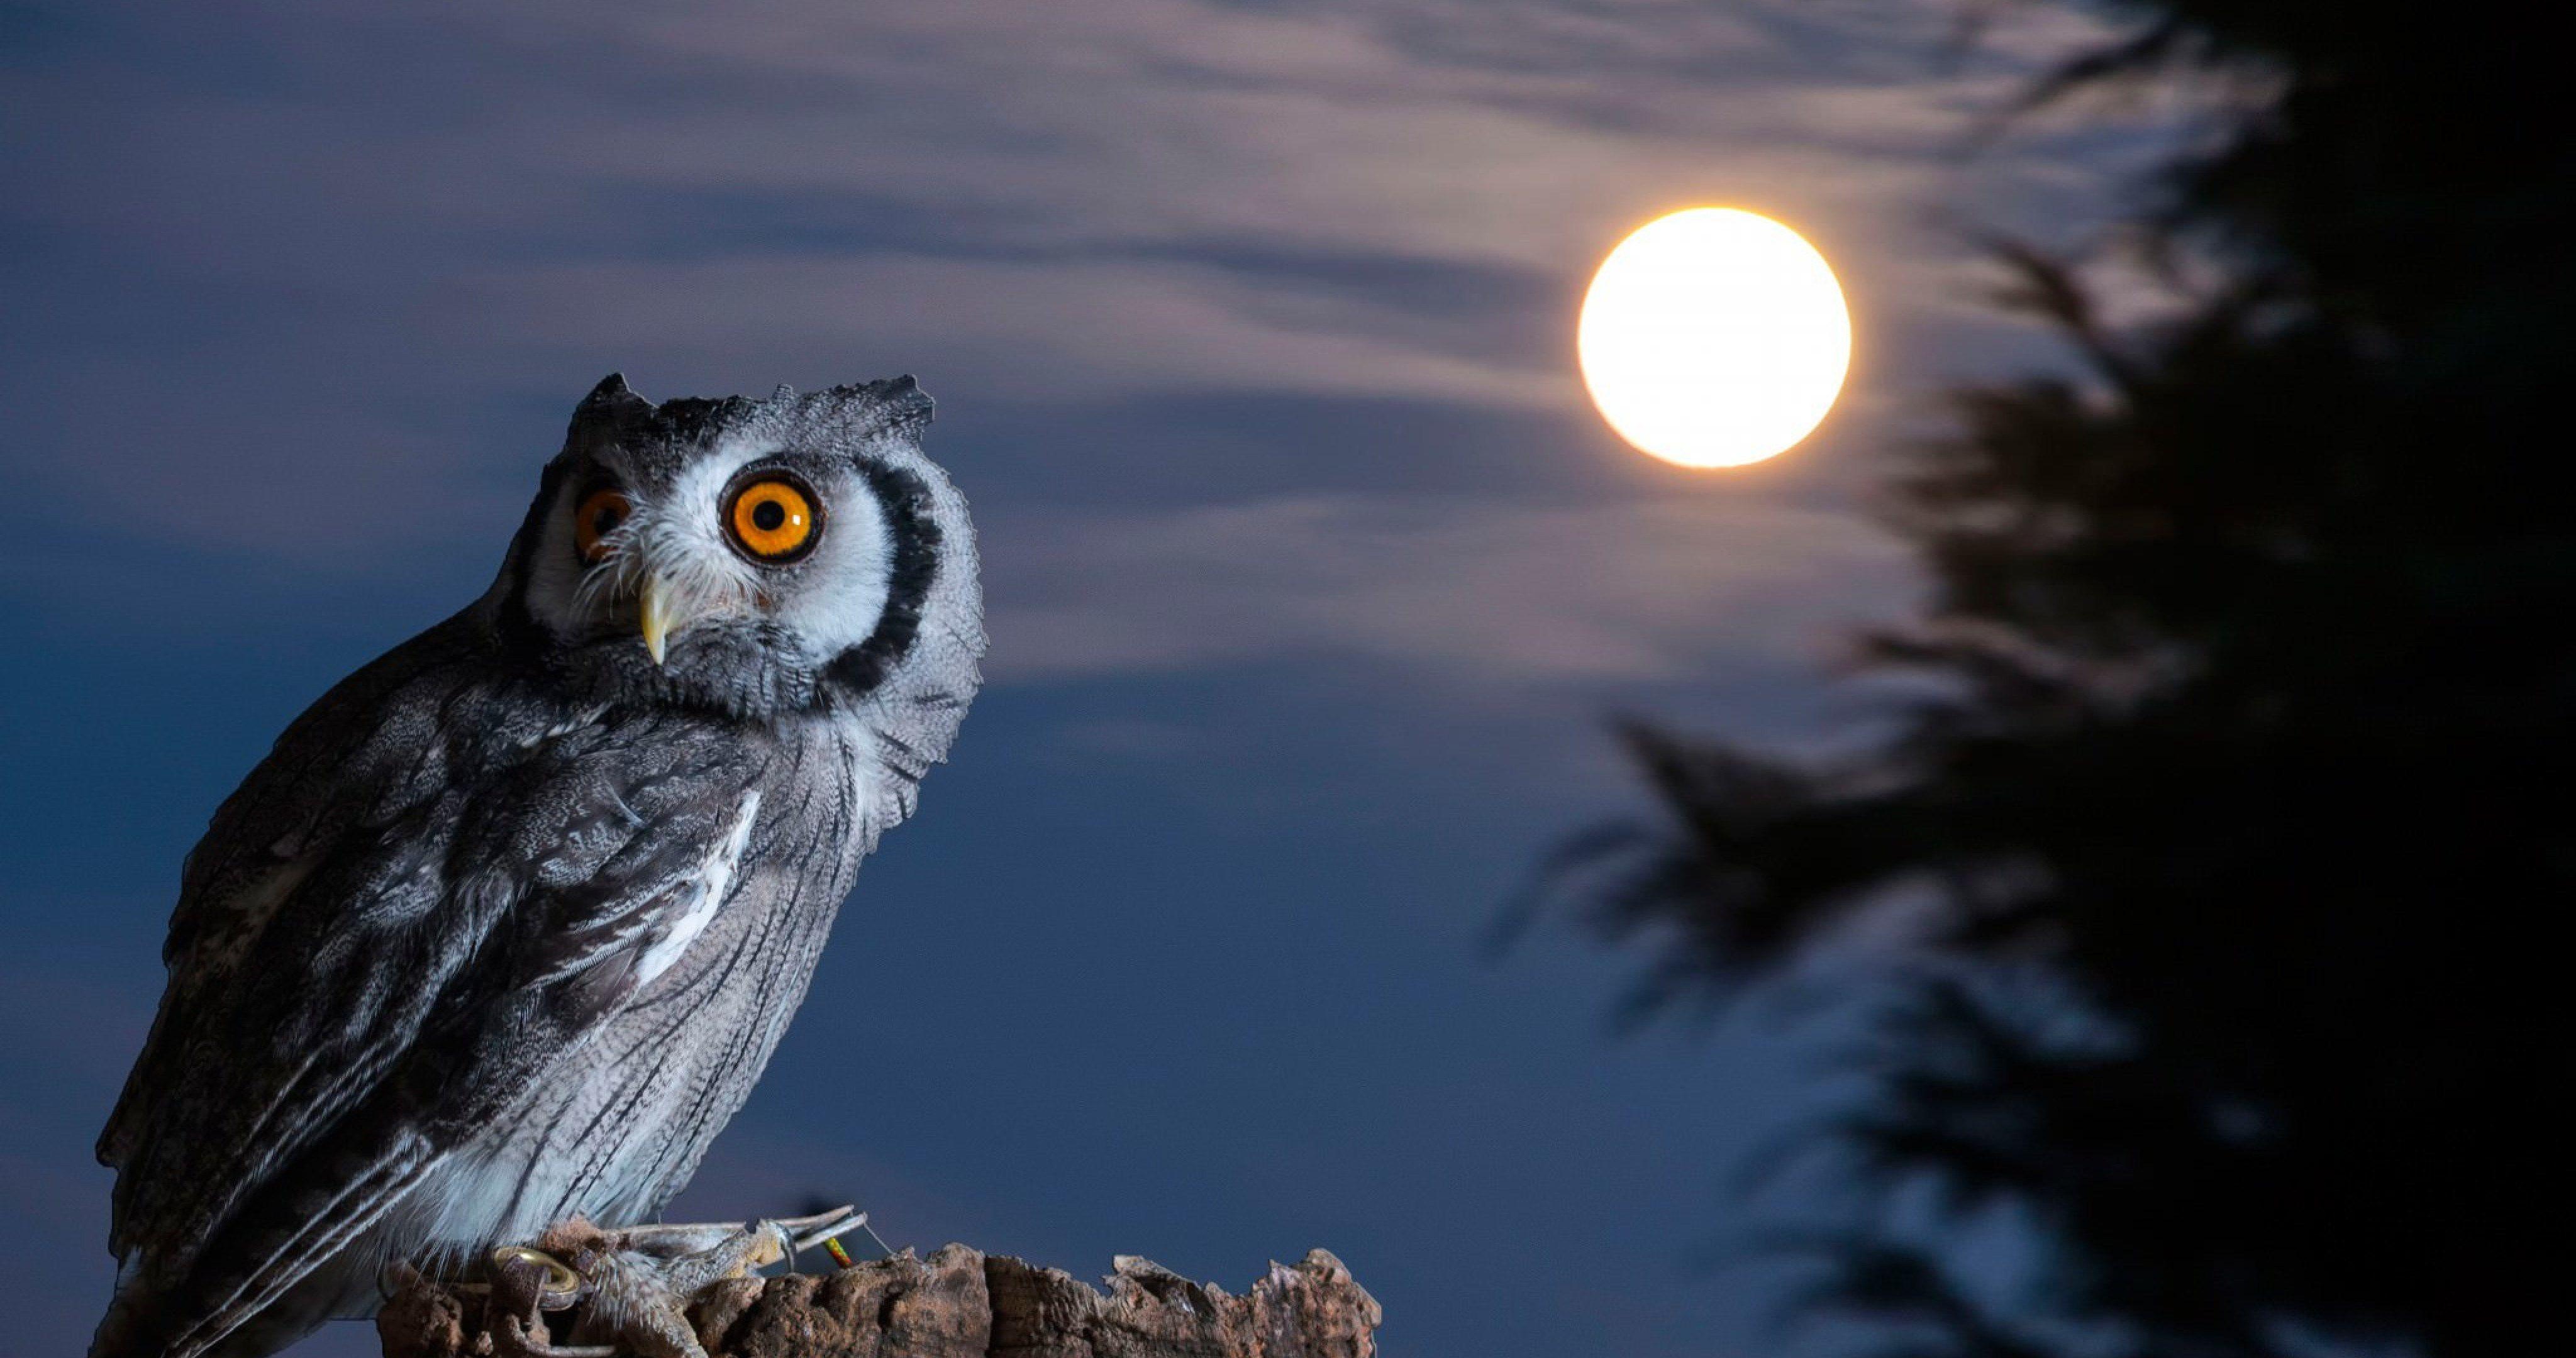 Night Bird Owl 4k Ultra Hd Wallpaper Owl Wallpaper Owl Owl Bird